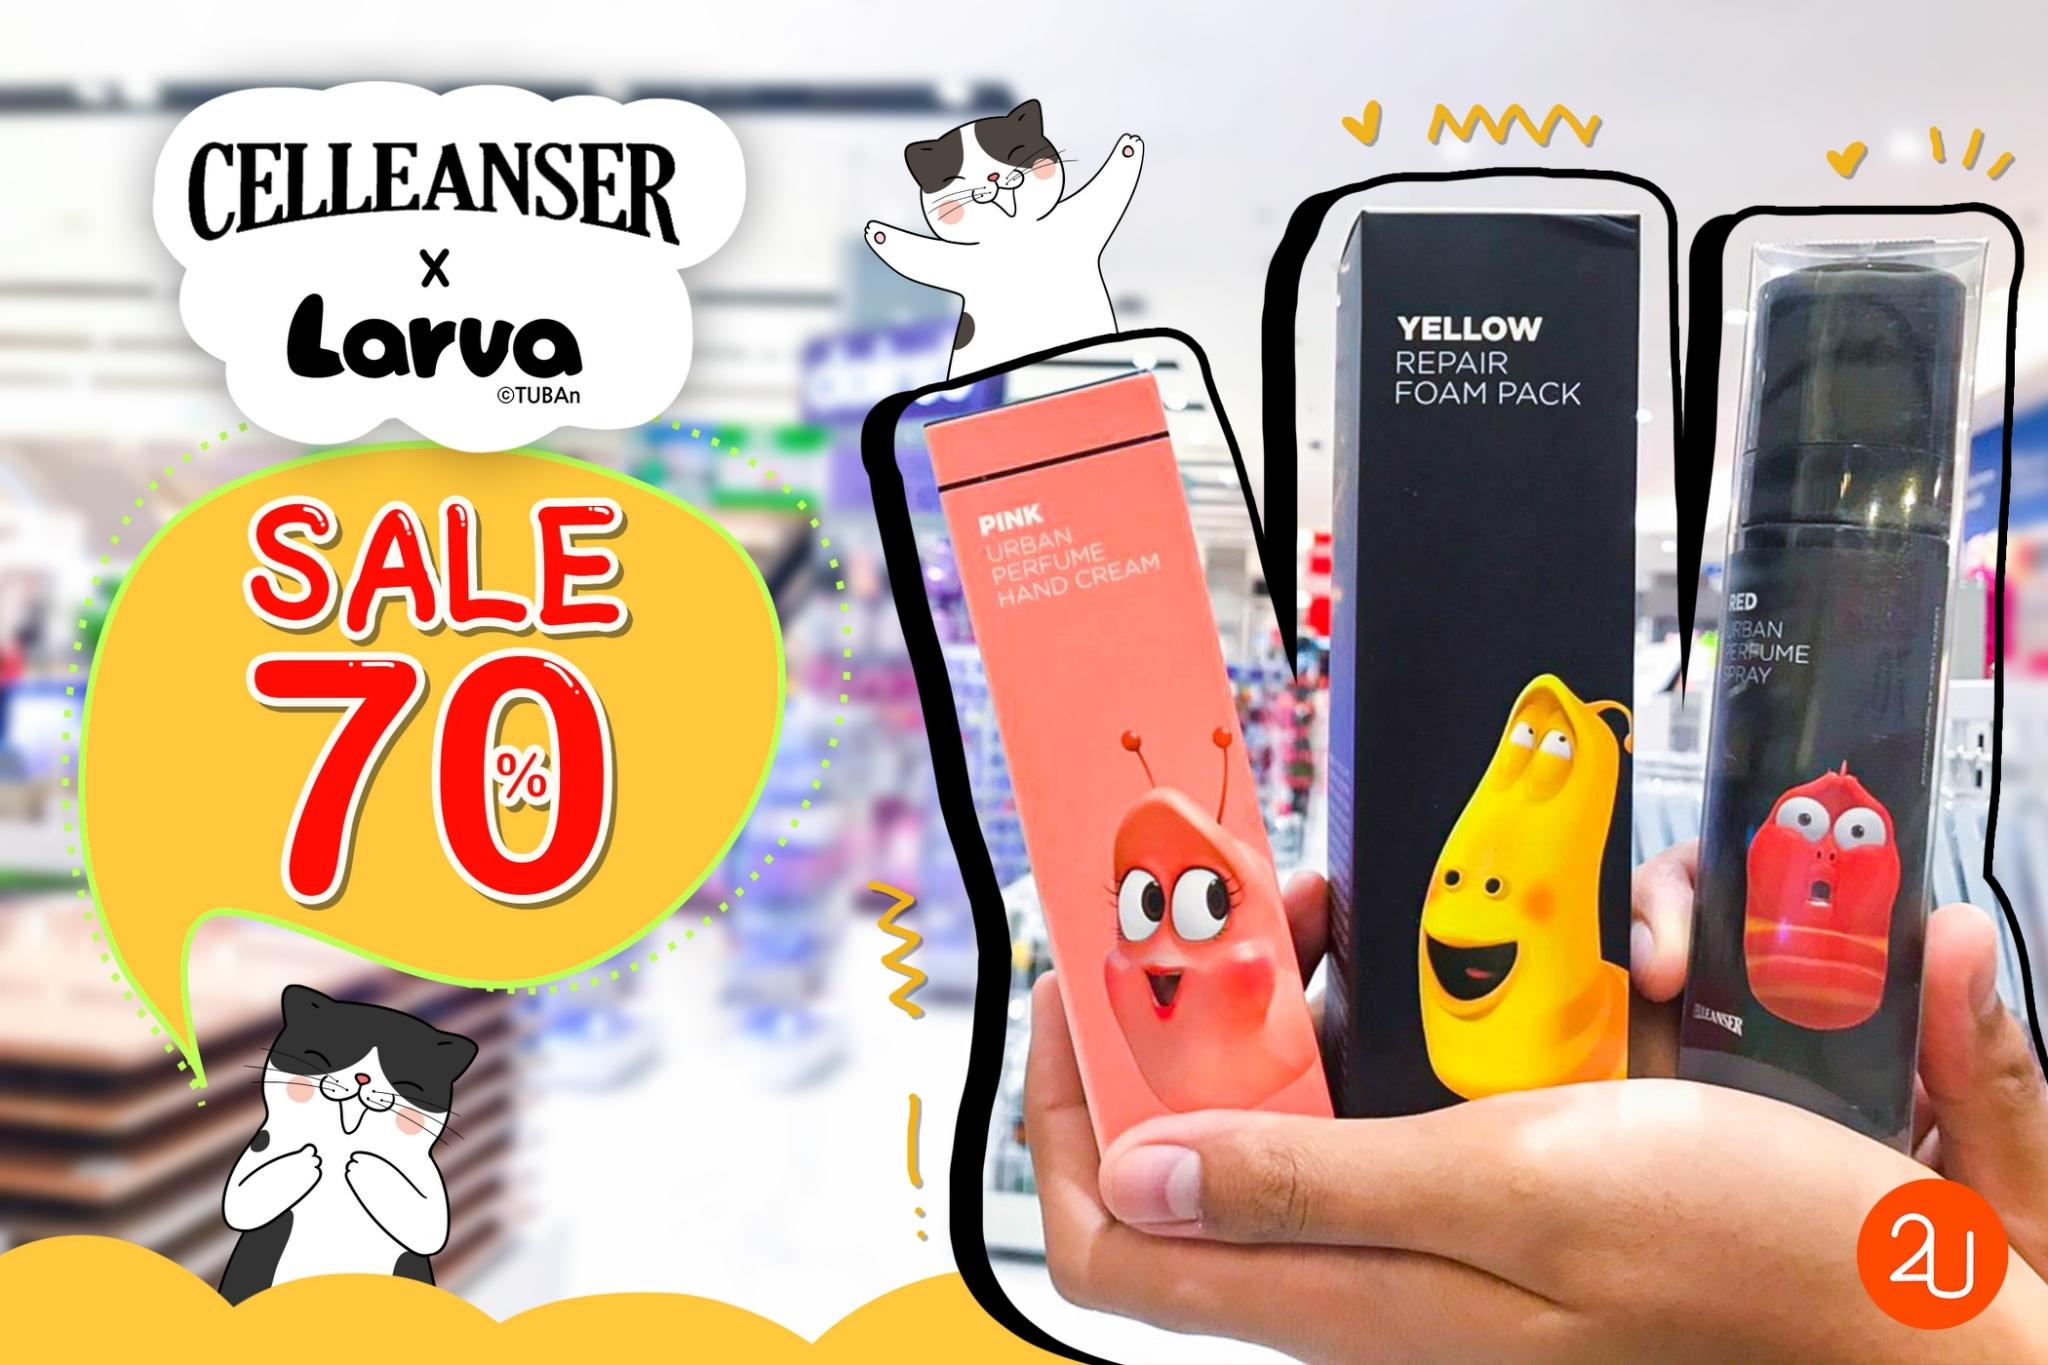 promotion Celleanser x Larva sale 70